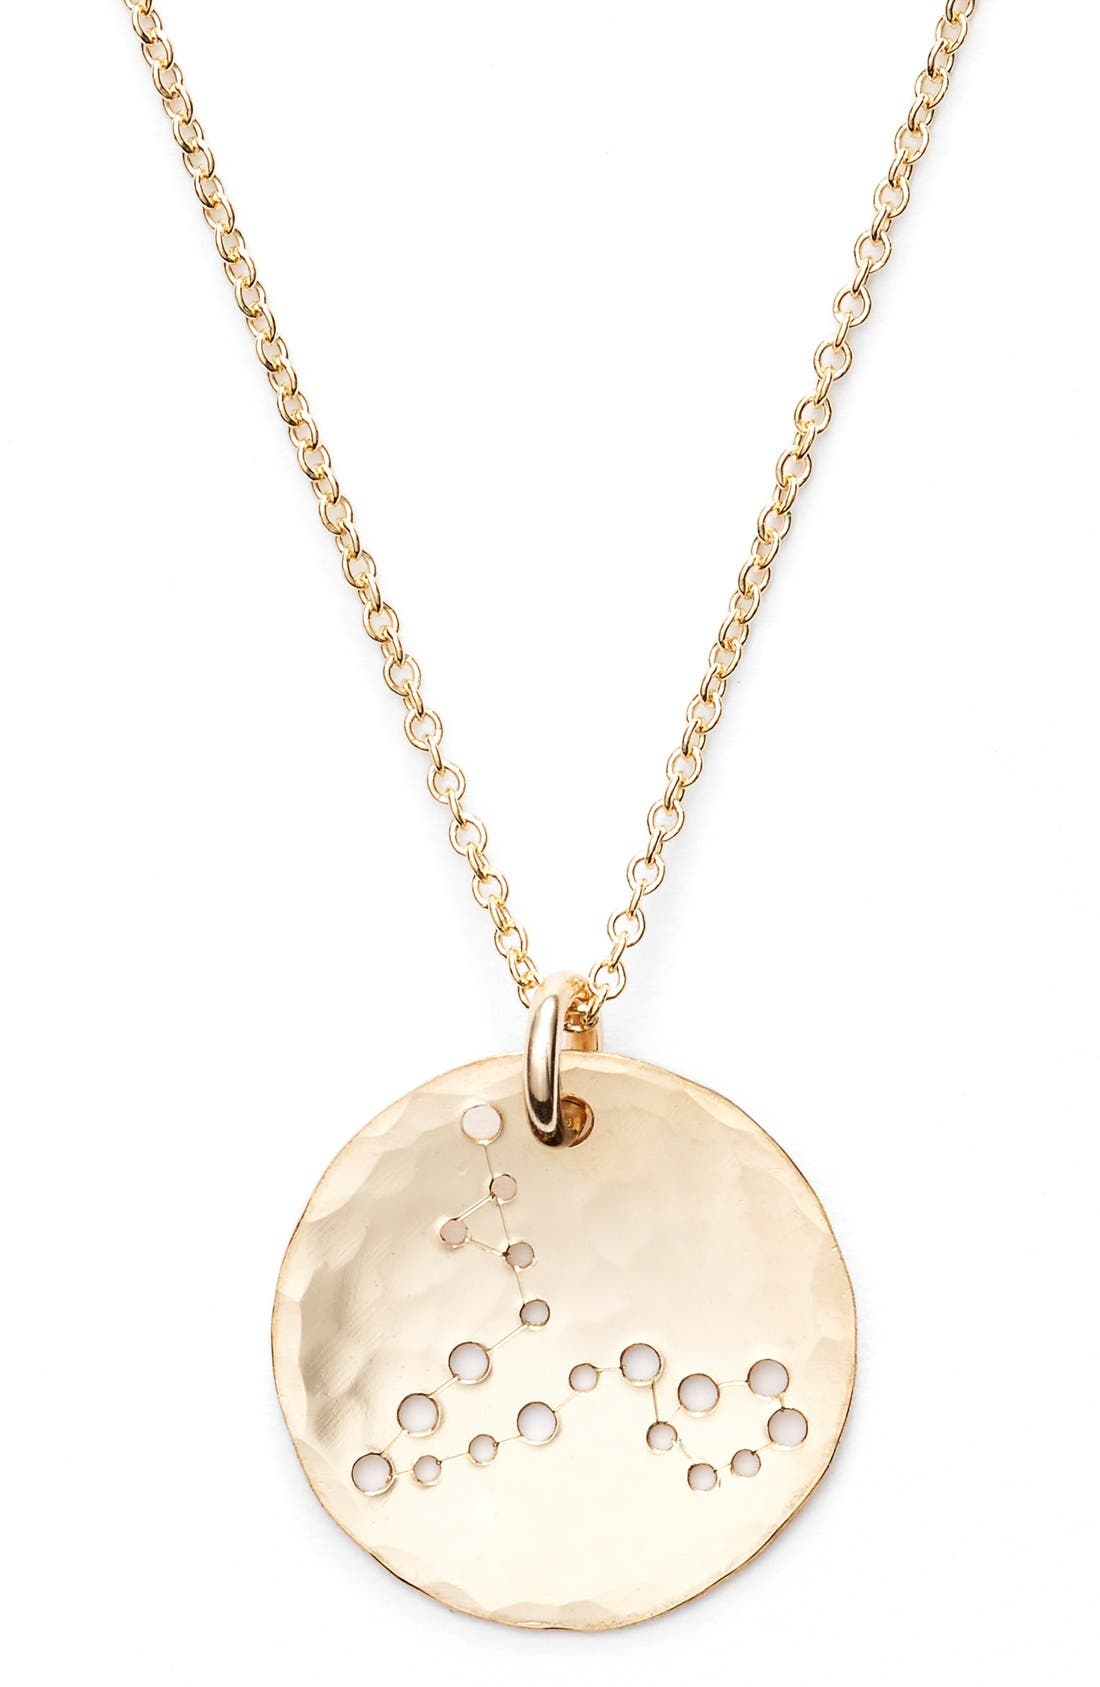 Ija 'Small Zodiac' 14k-Gold Fill Necklace,                             Alternate thumbnail 24, color,